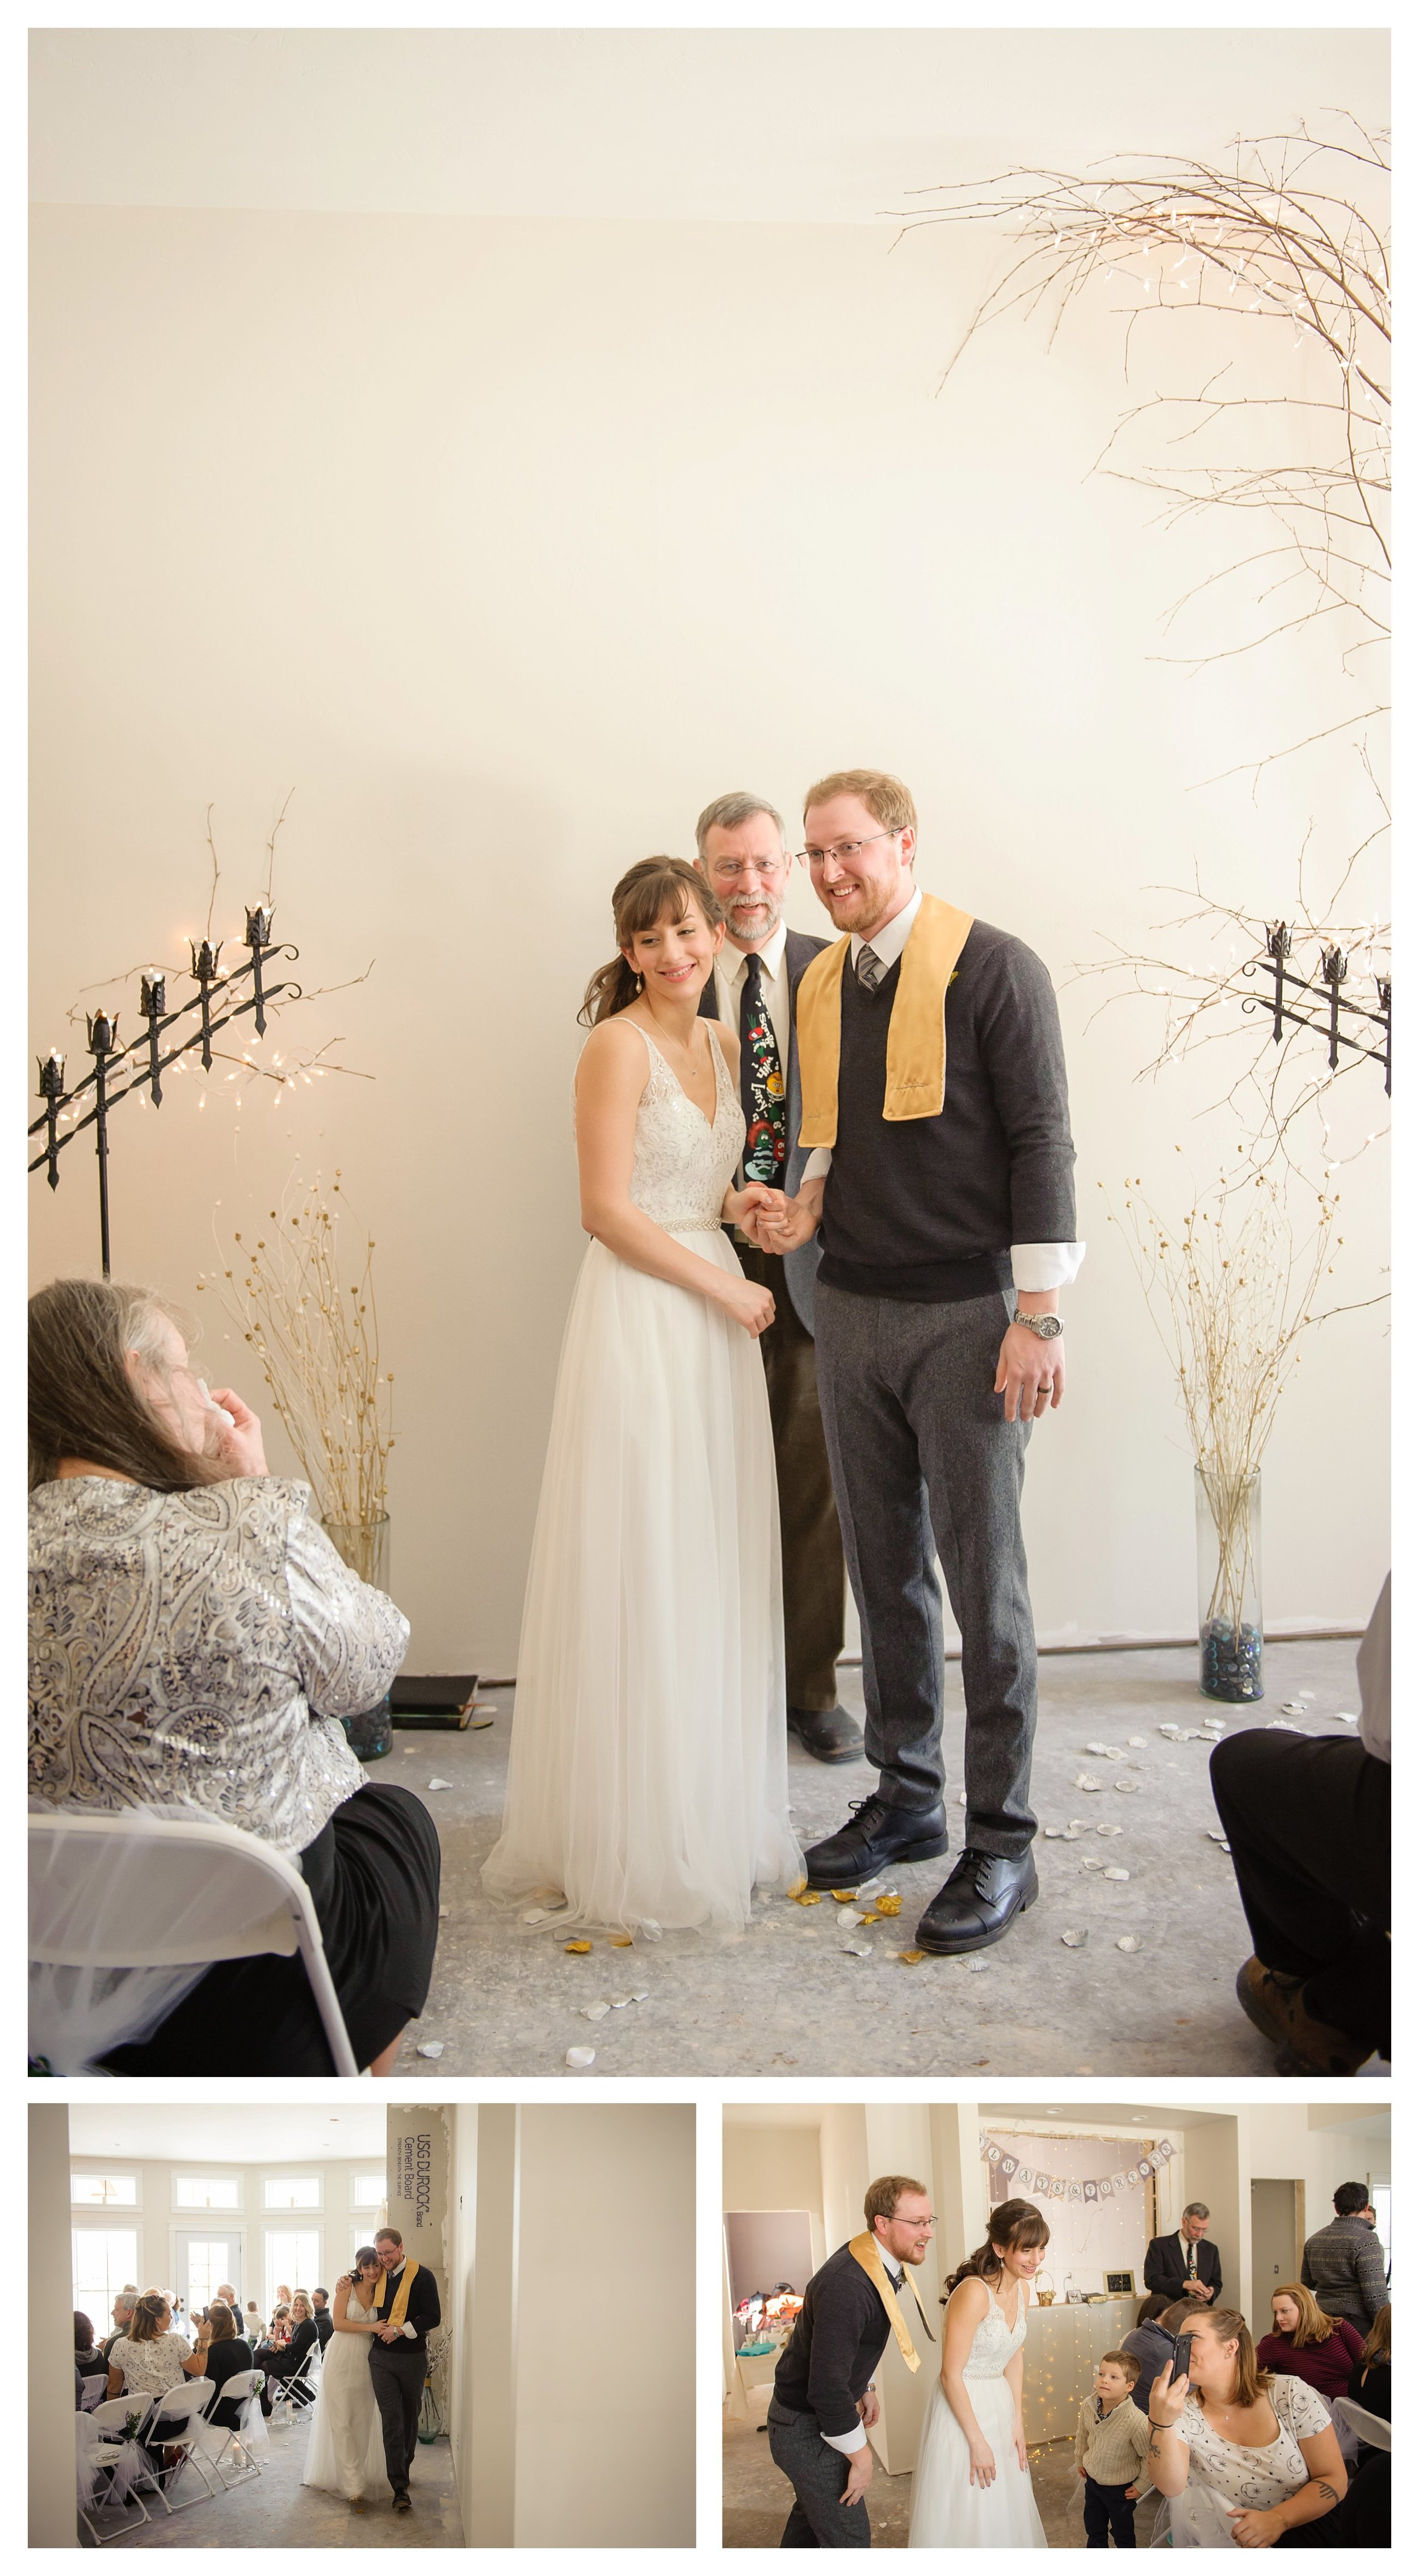 wisconsin wedding photographer timber baron inn bayfield wi ps 139 photography jen jensen_0208.jpg